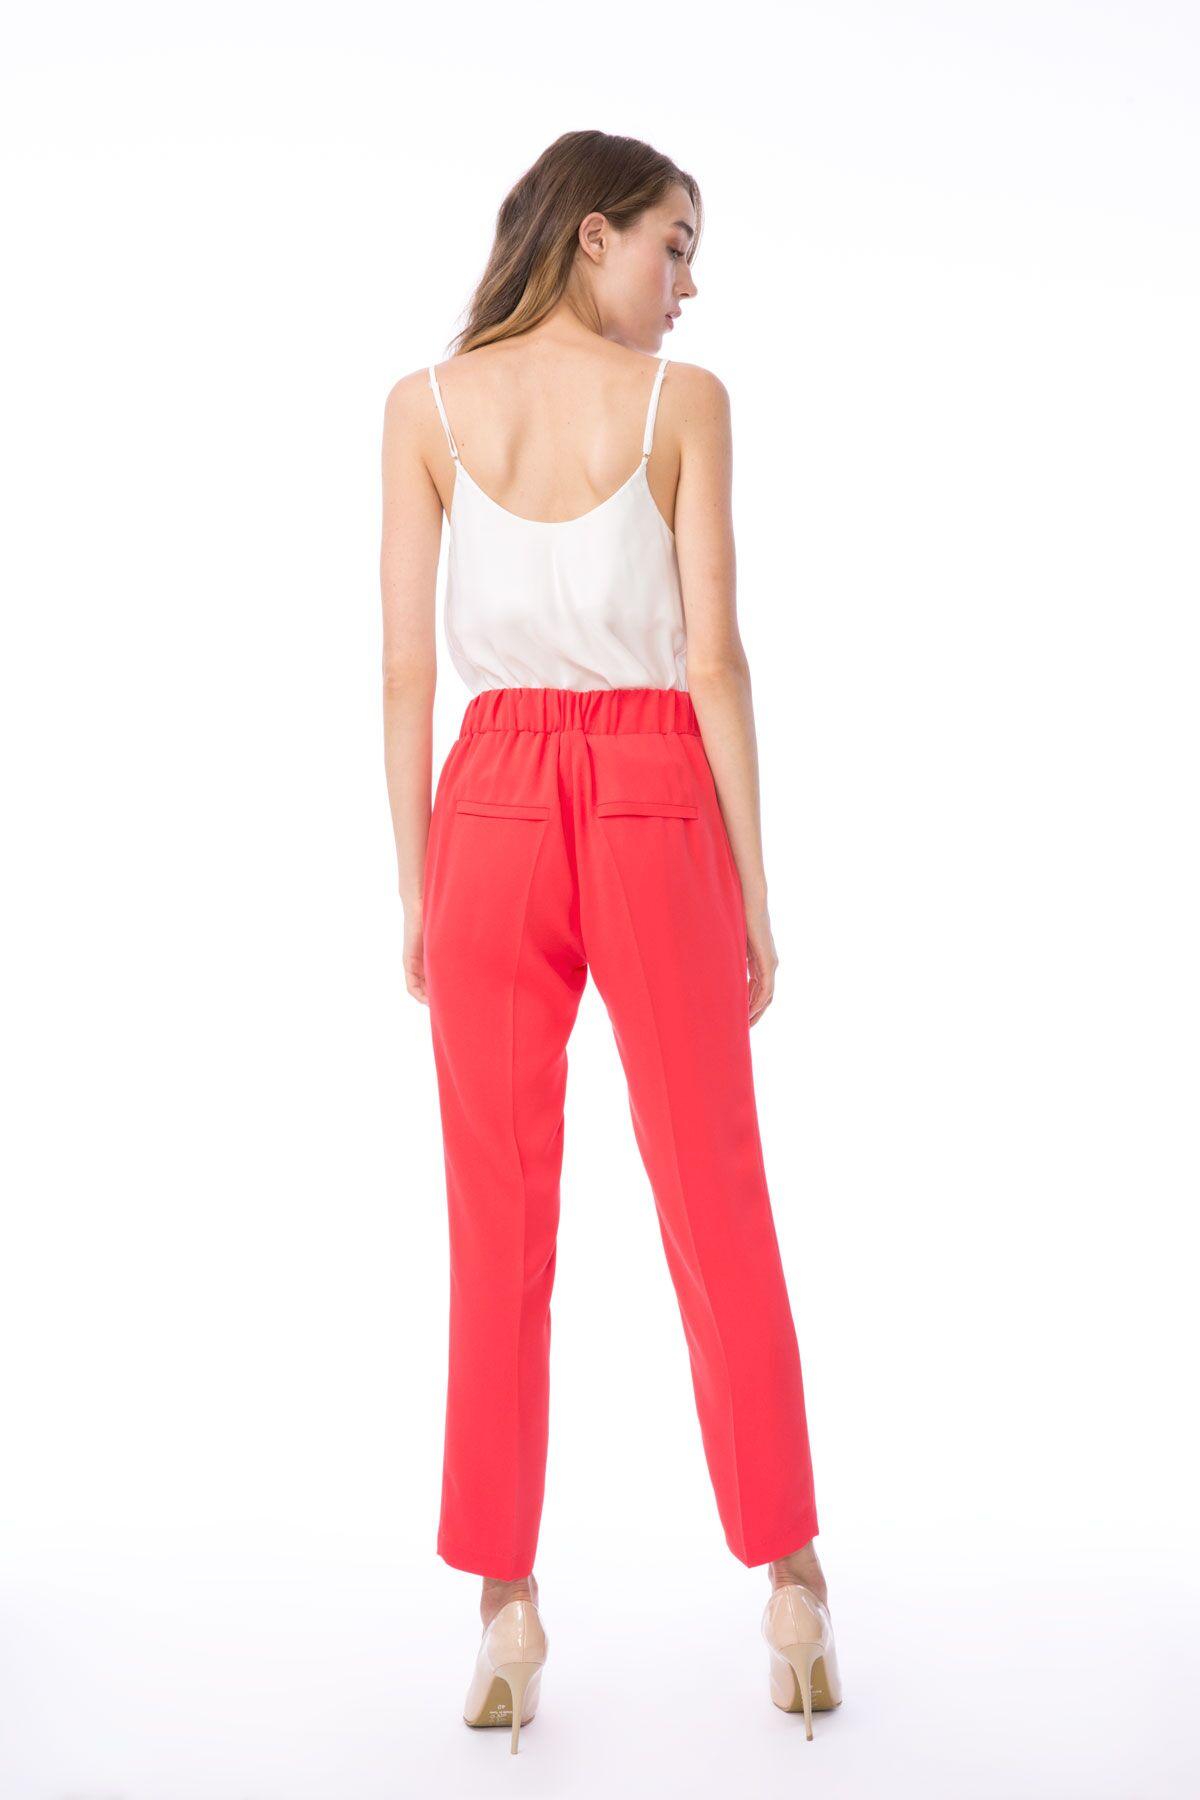 Havuç Kesim Bağcıklı Pembe Kumaş Pantolon